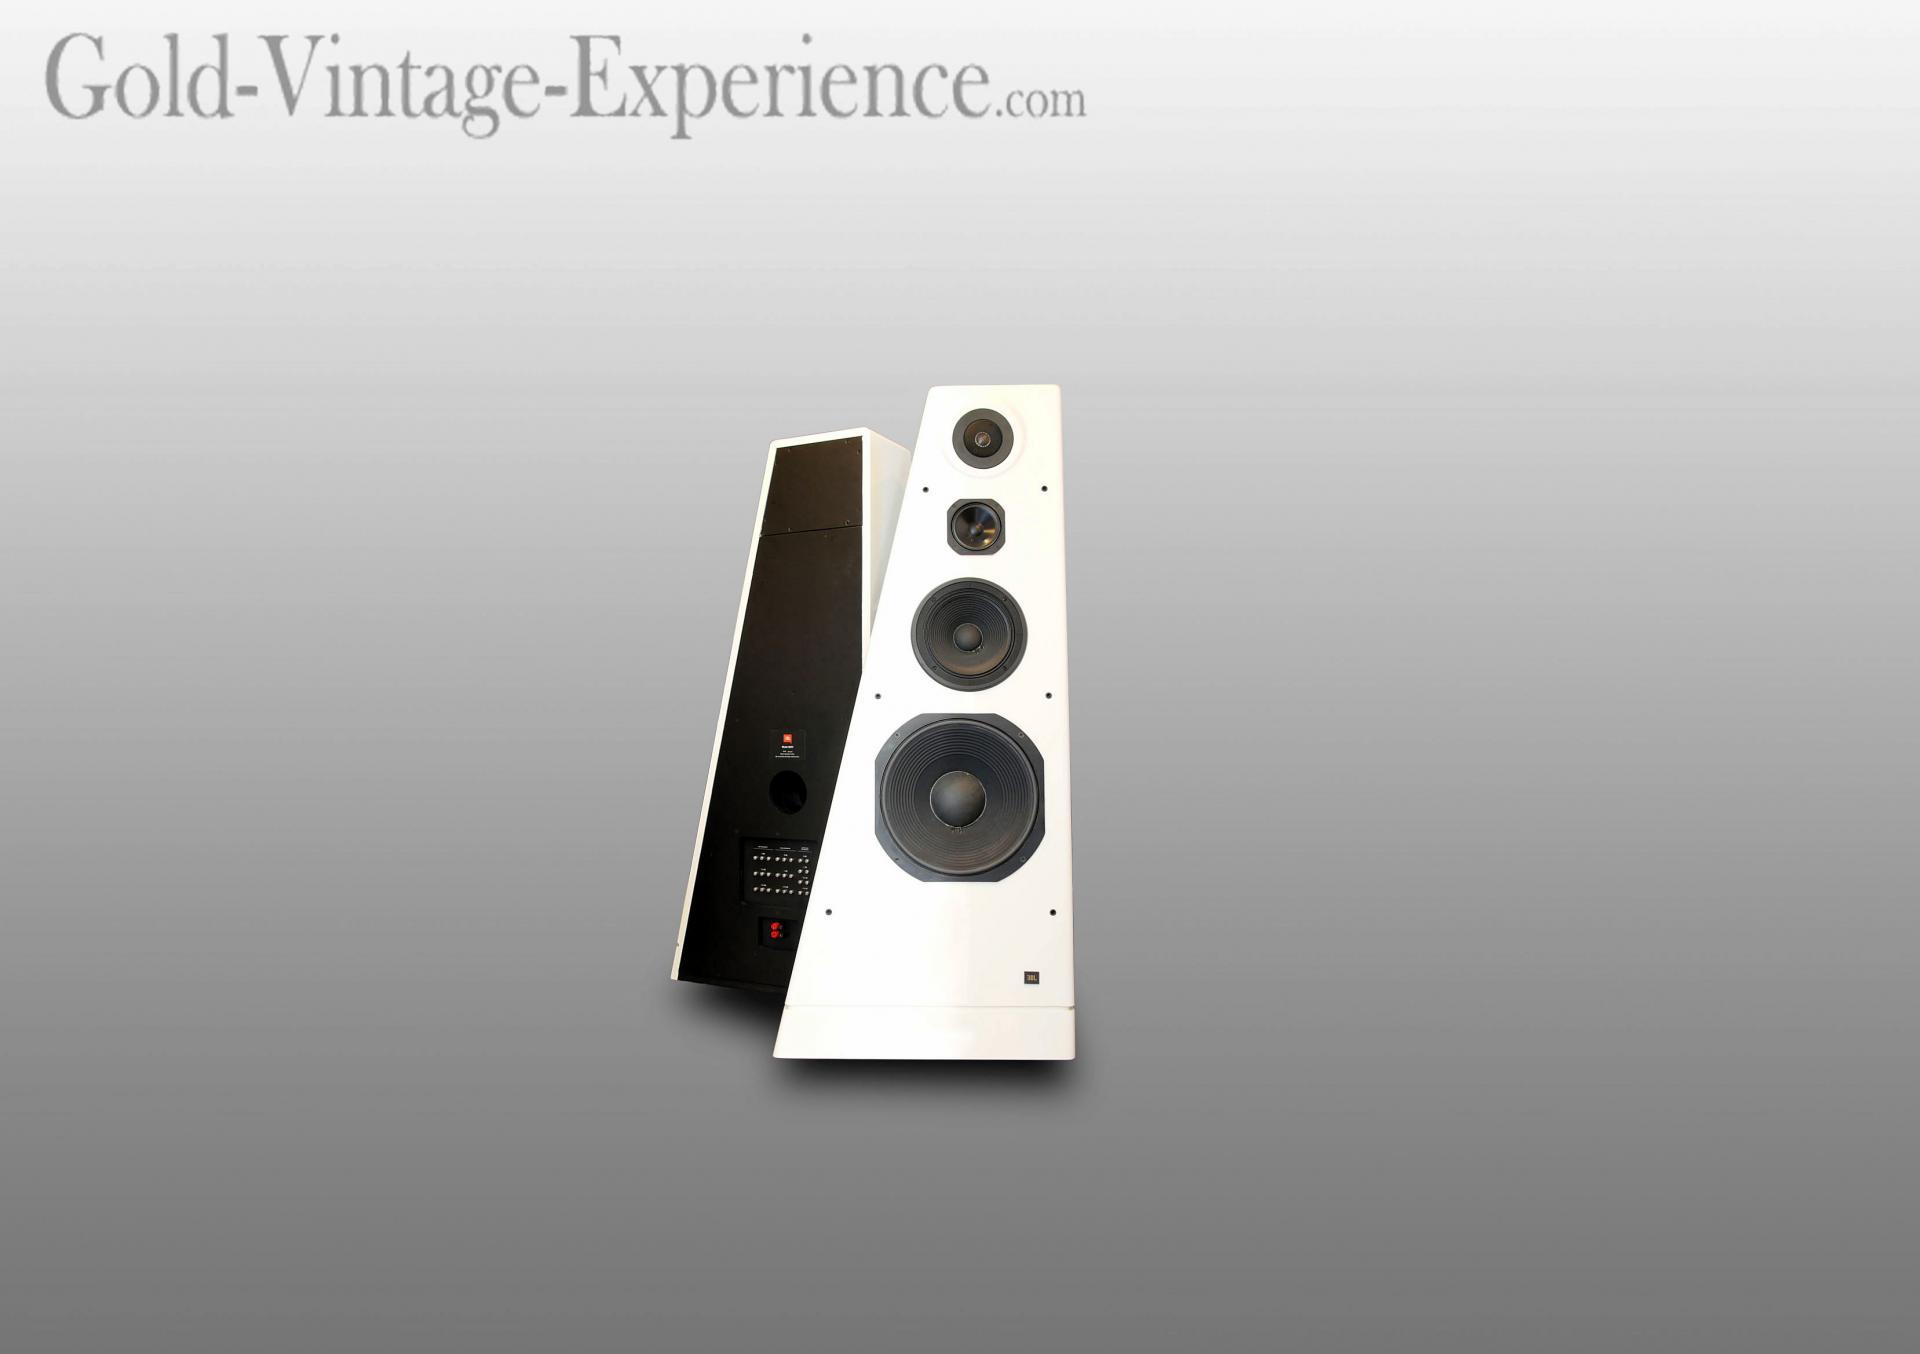 enceintes jbl 250ti bass reflex. Black Bedroom Furniture Sets. Home Design Ideas